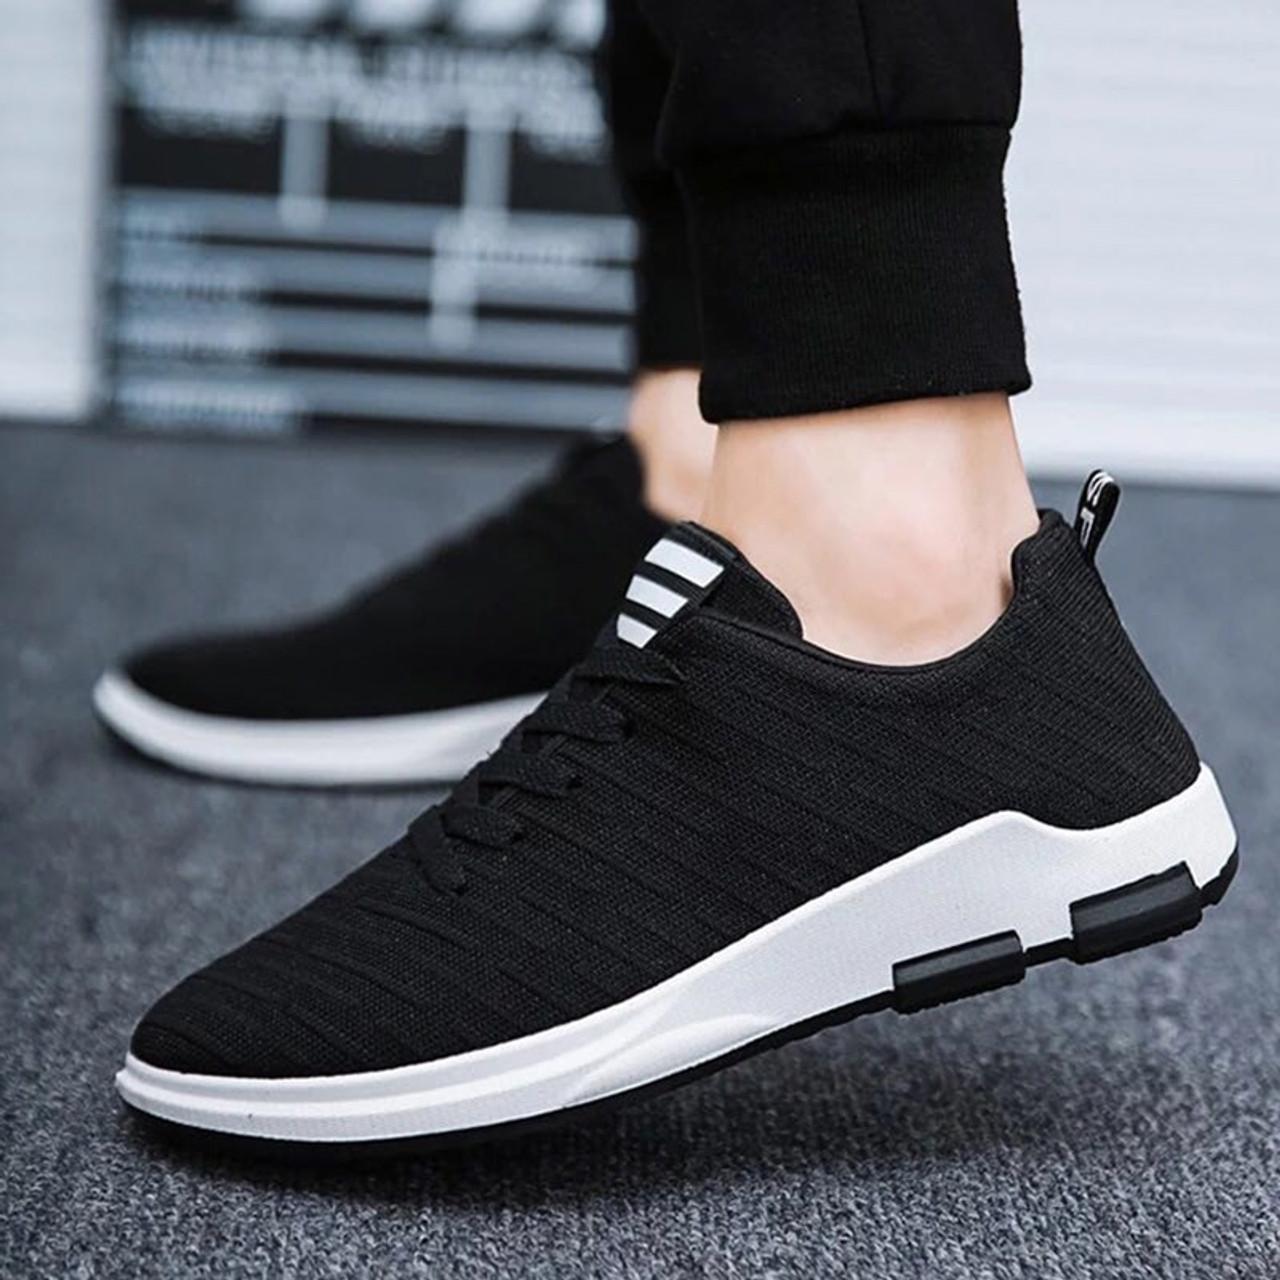 Ariari 2019 Spring Men's Casual Shoes